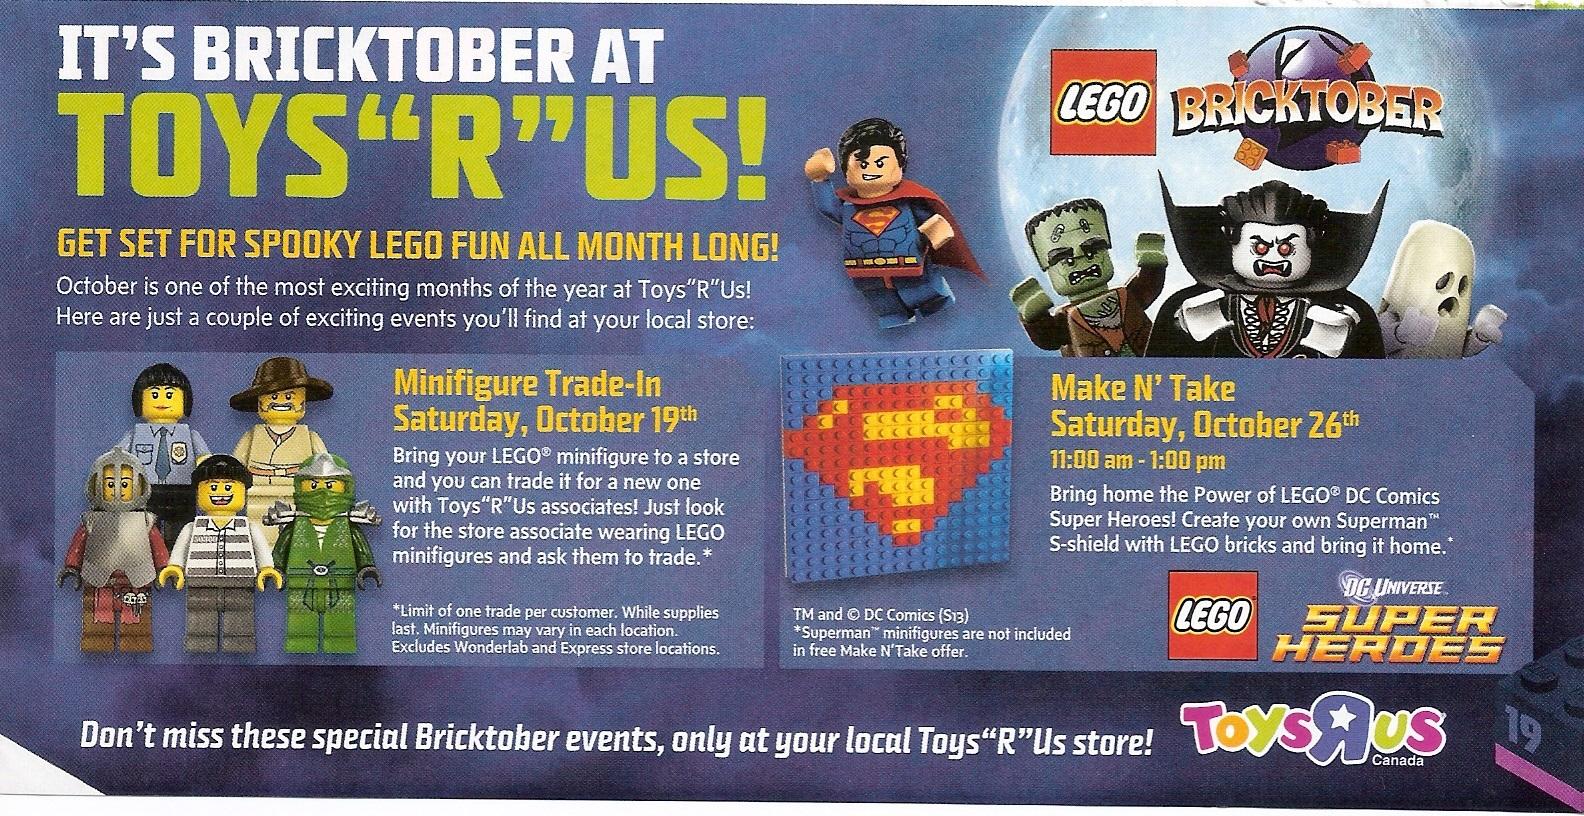 Toys N Bricks | LEGO News, LEGO Reviews, LEGO Sales and More